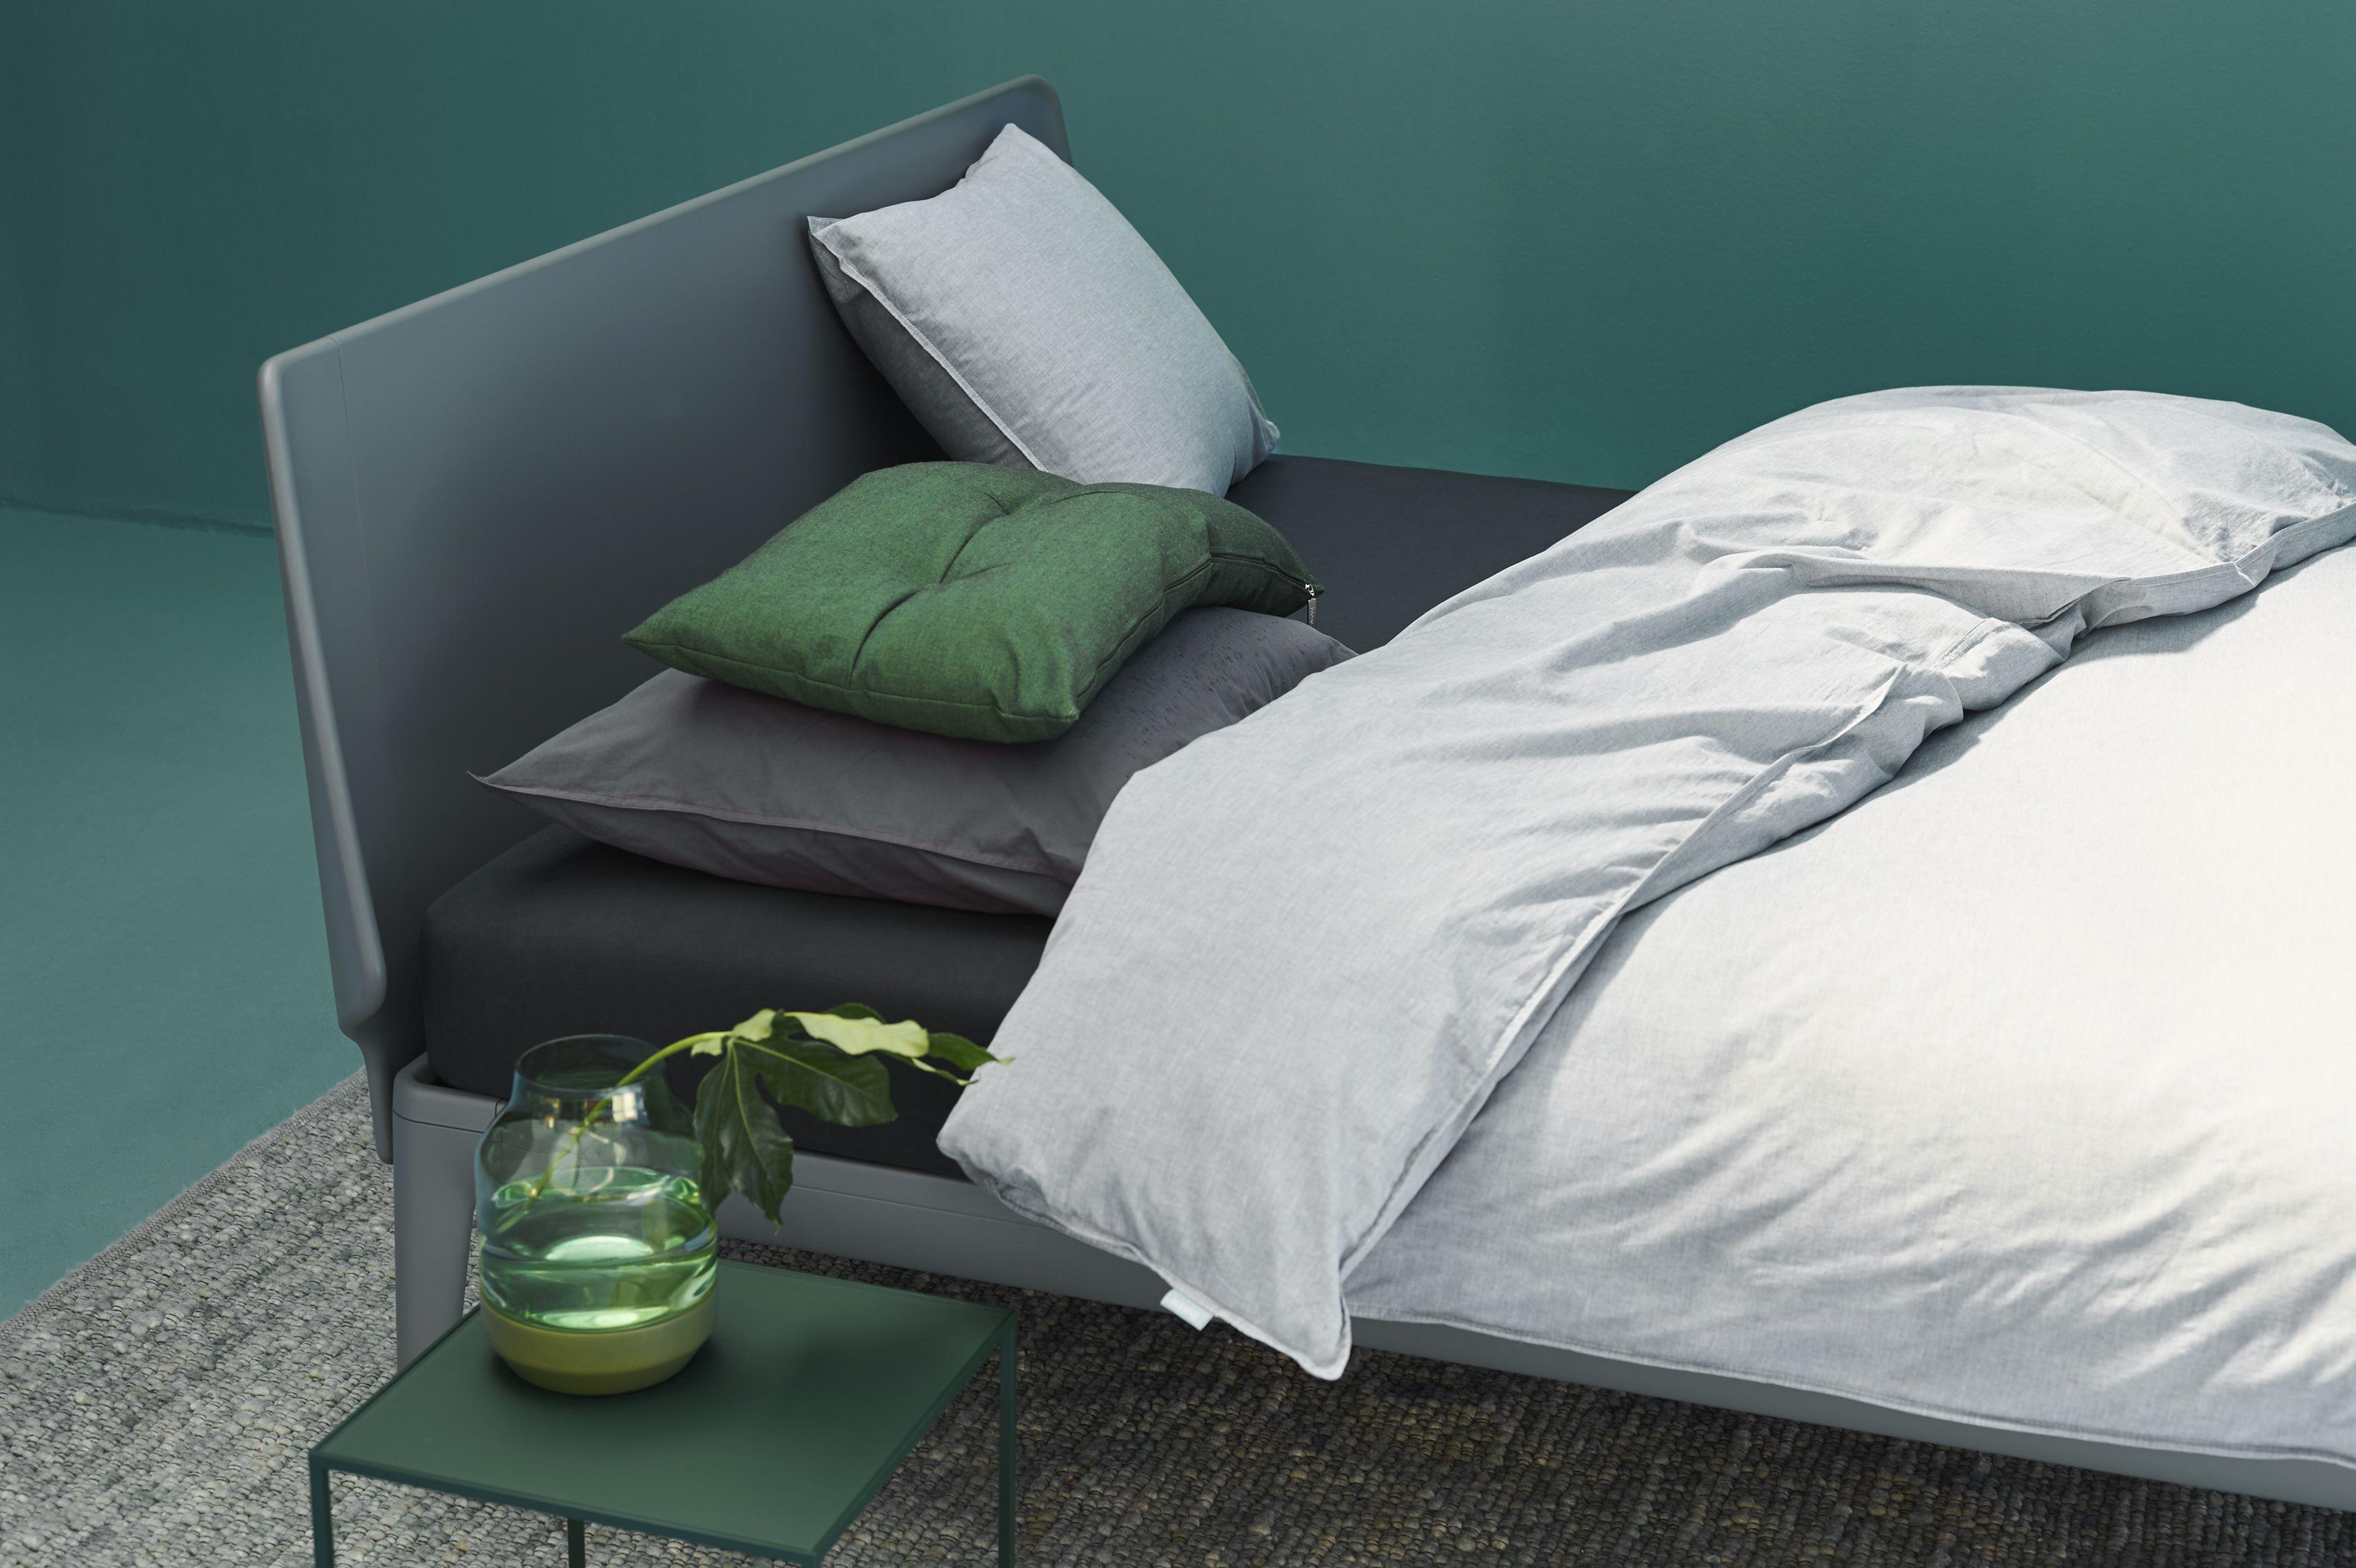 Auping Essential in Cool Grey# stoere slaapkamer | De Slaapkamer ...